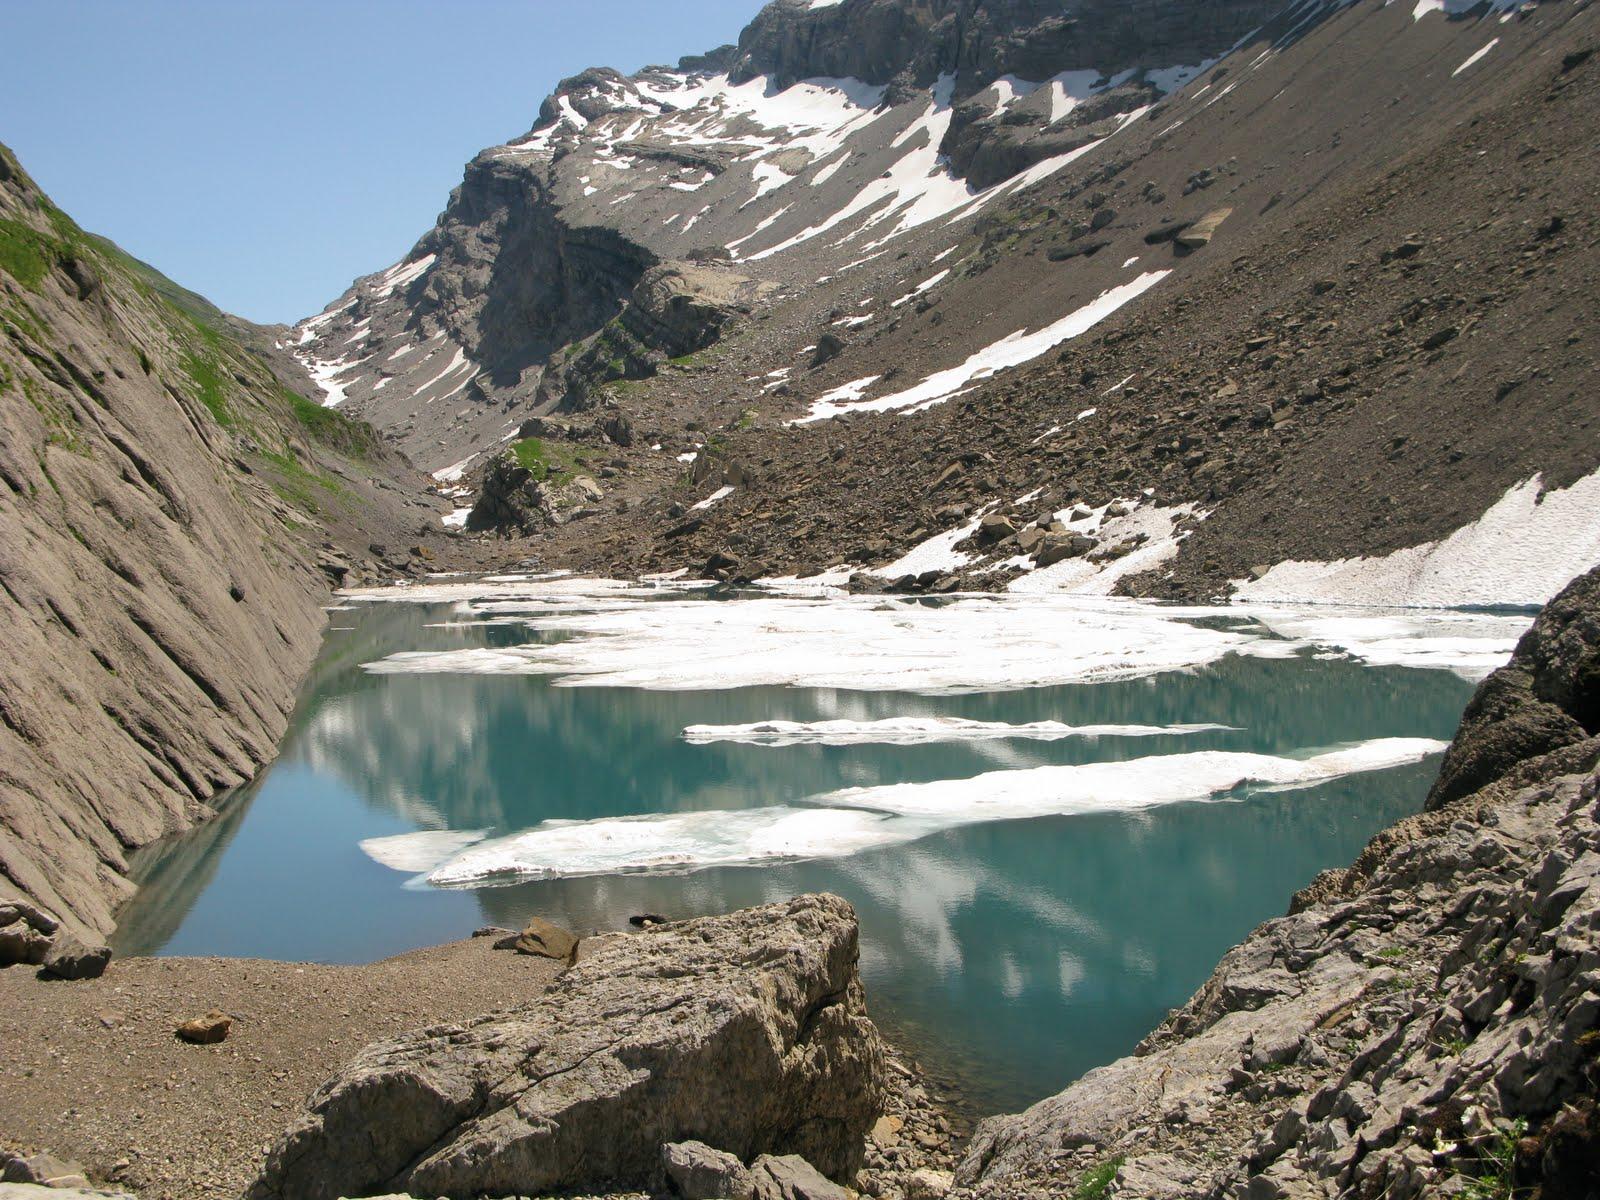 Photo : Alain Rongier (28 juin 2011) - Lac de Folly